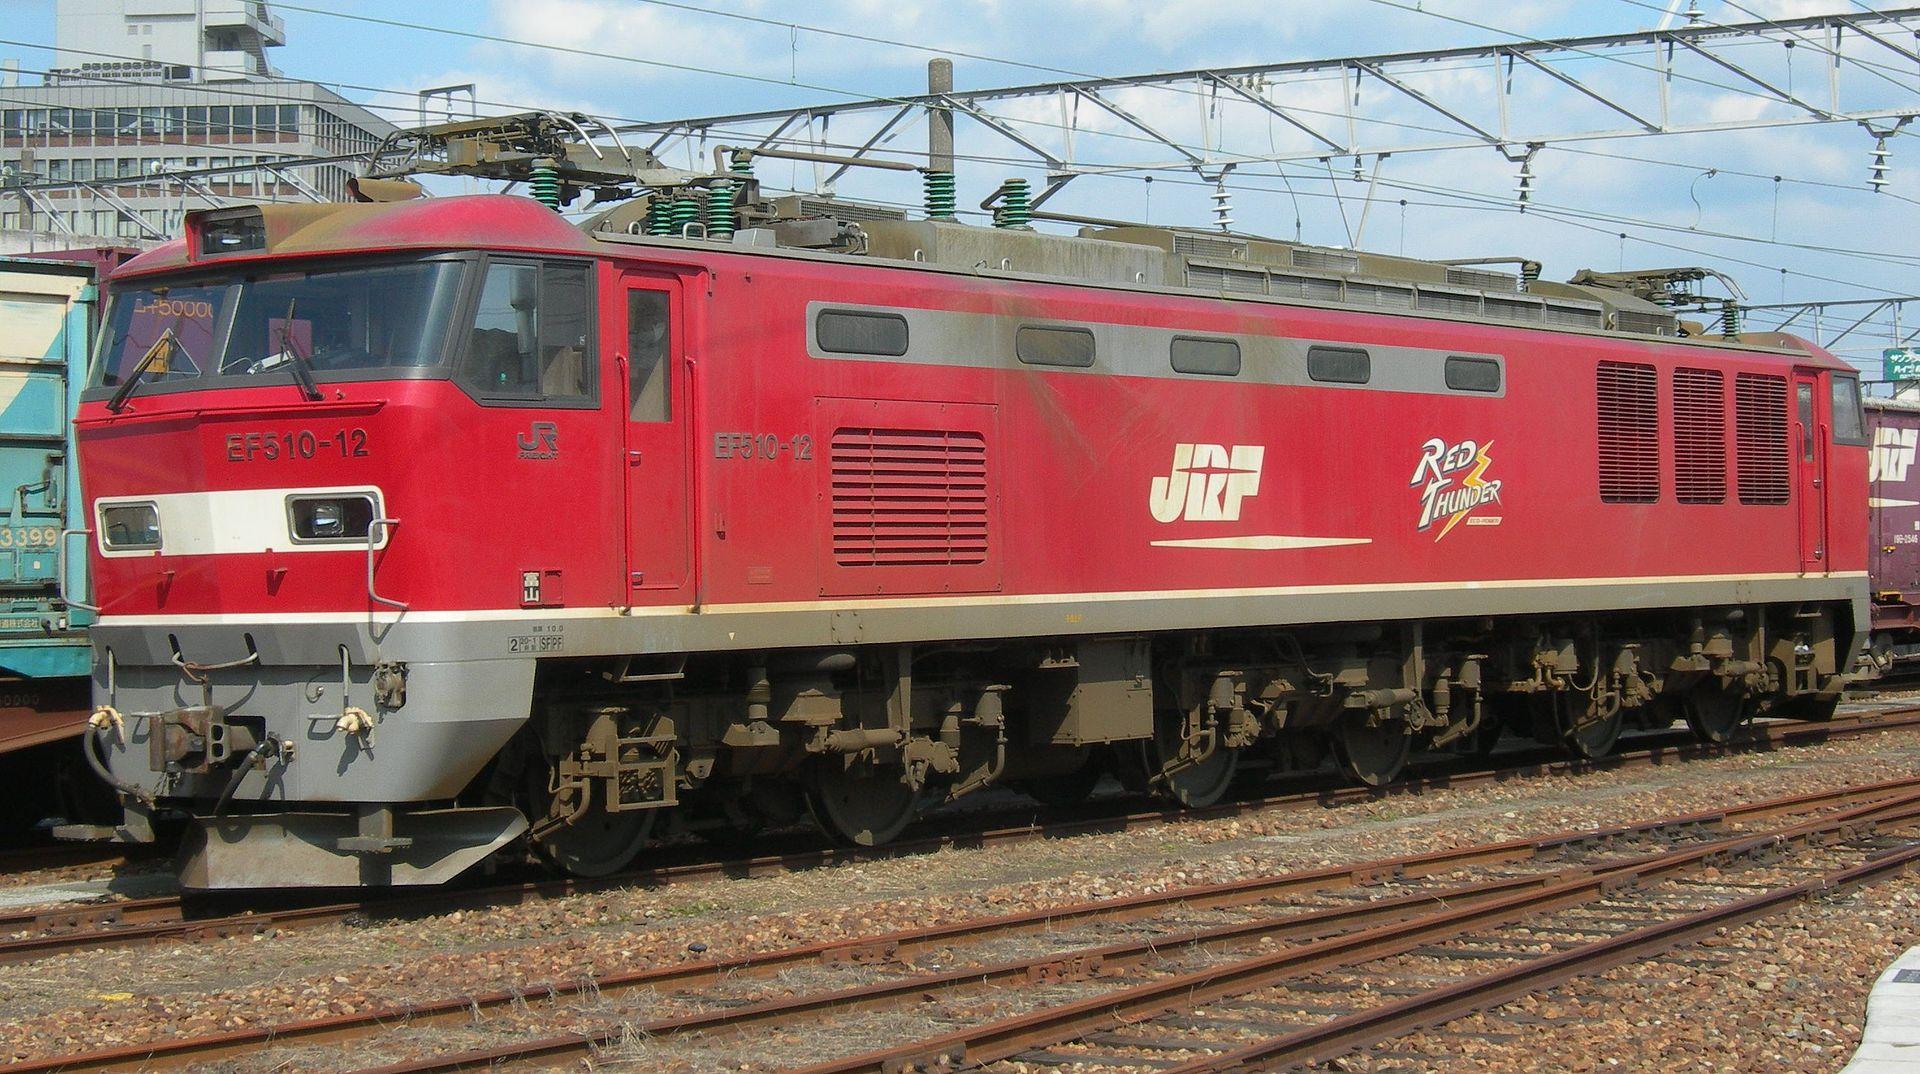 JRF_EF510-12_2016102521272241e.jpg